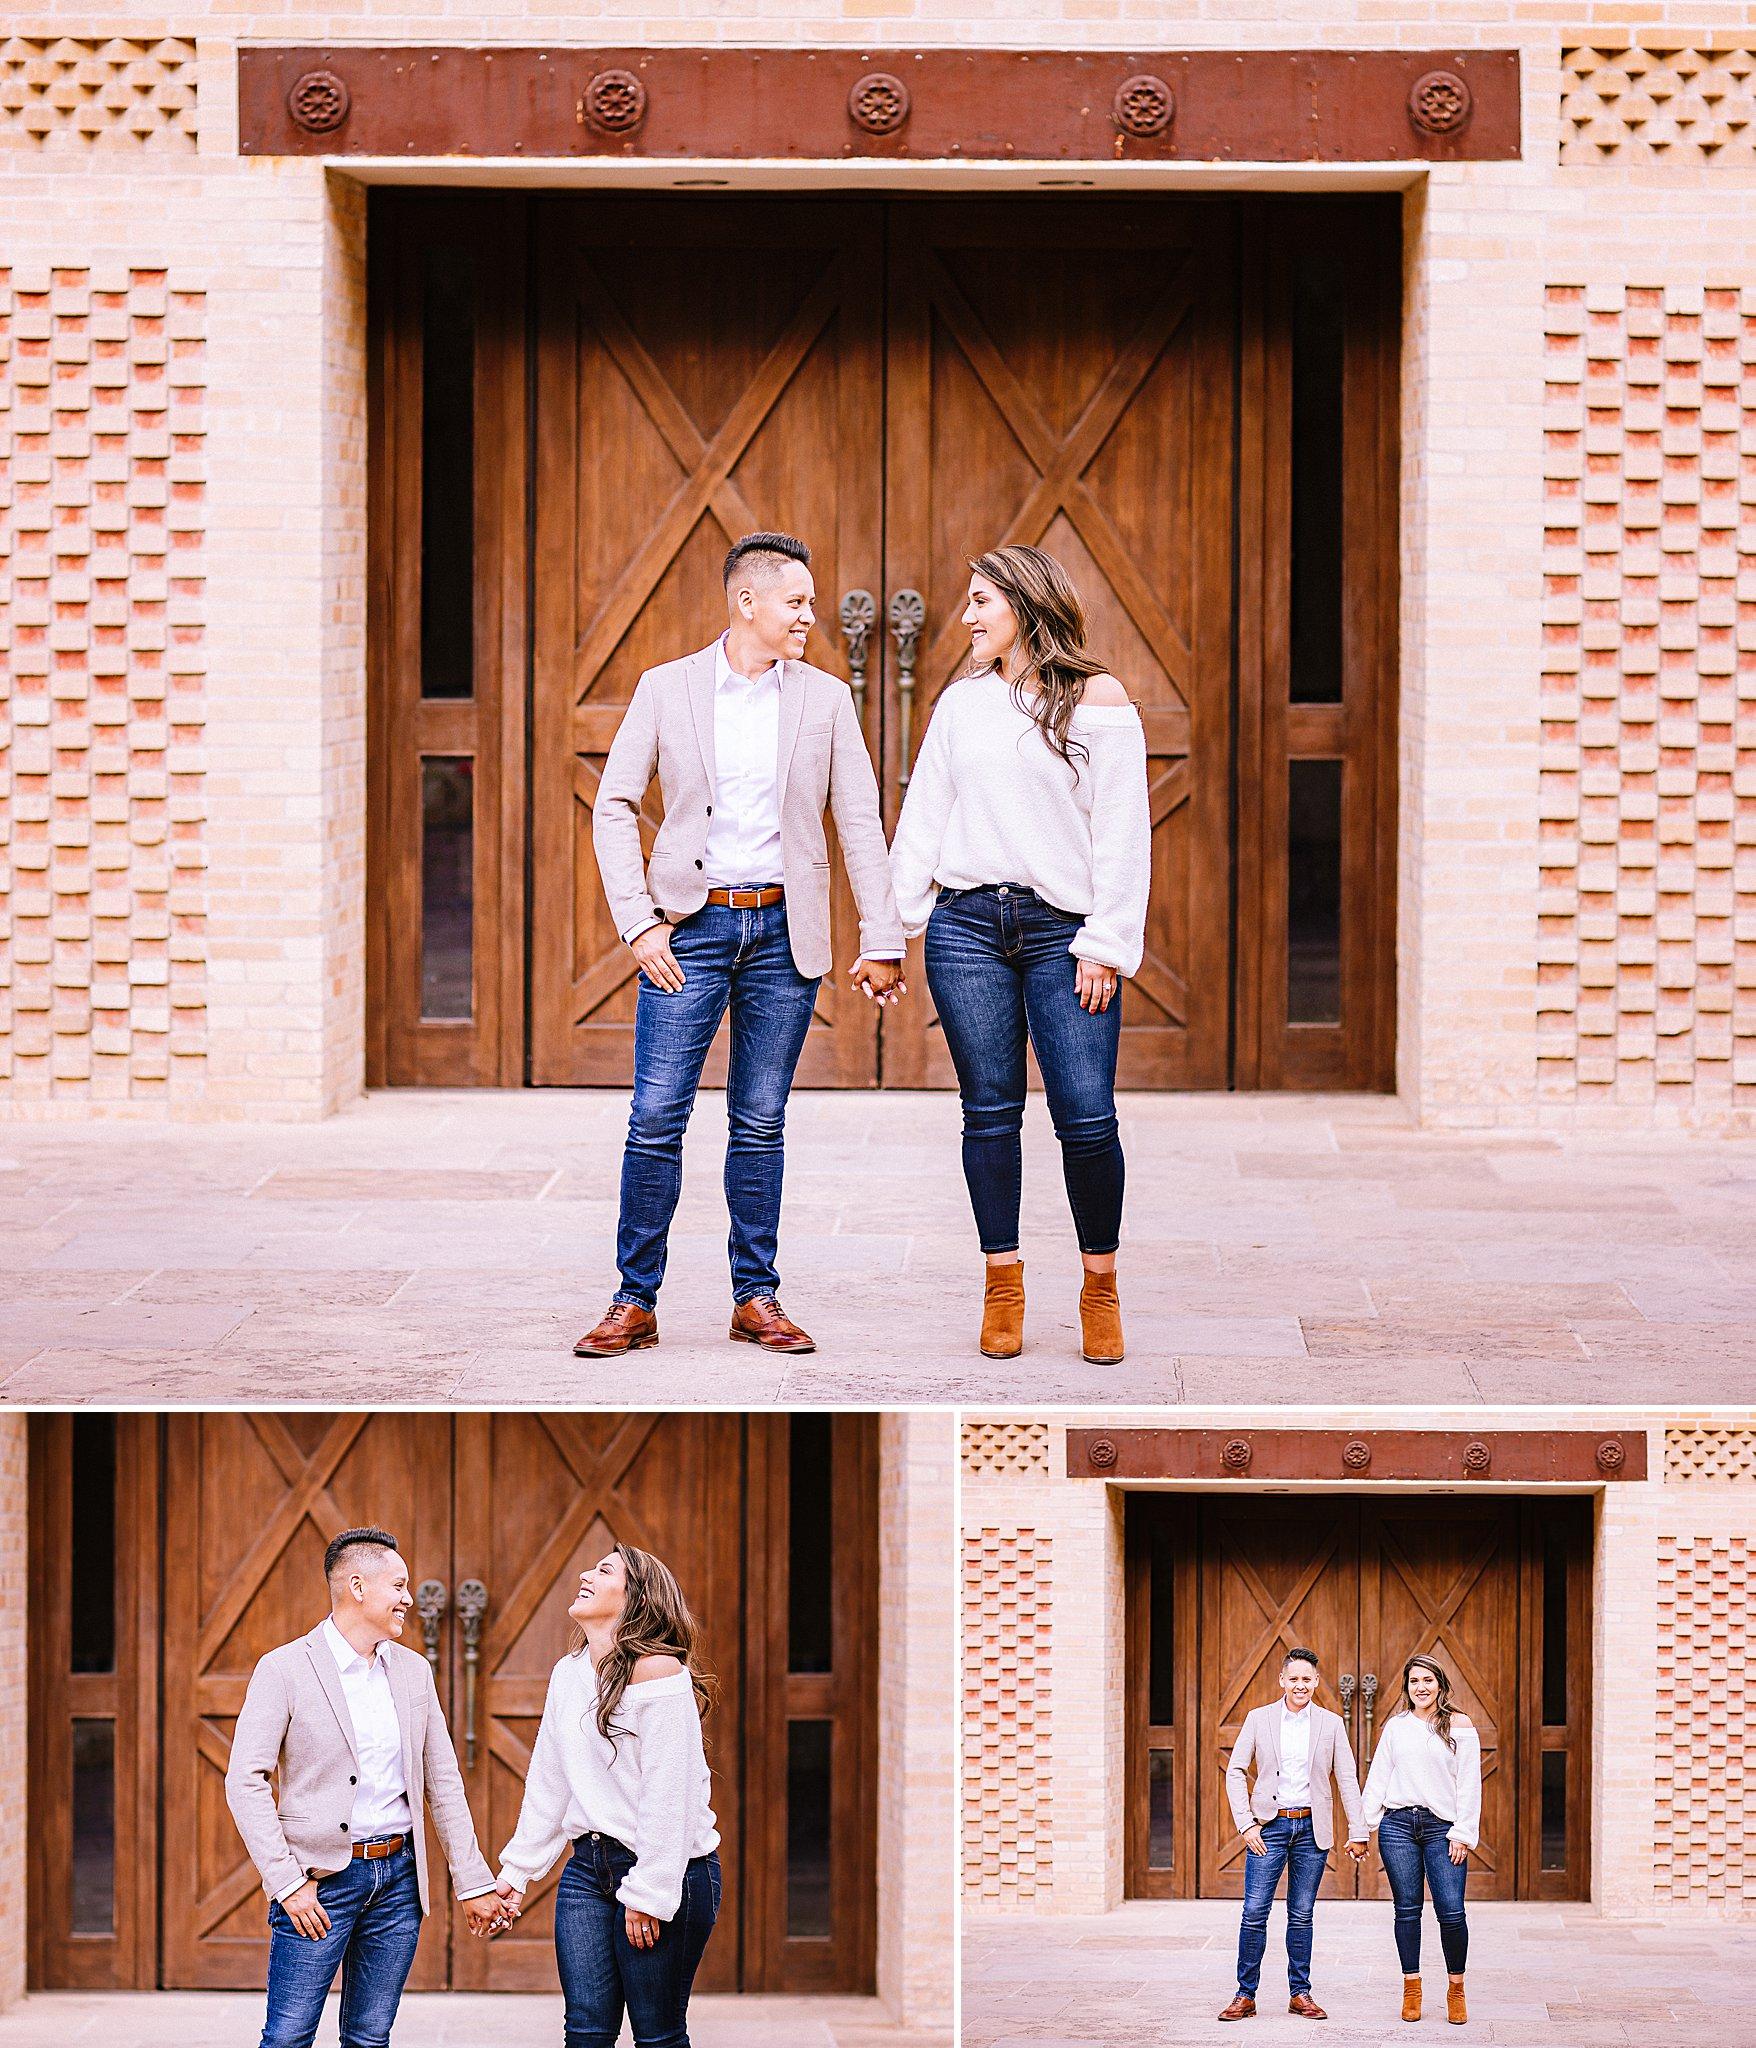 Carly-Barton-Photography-Texas-Engagement-Photographer-The-Historic-Pearl-San-Antonio_0006.jpg